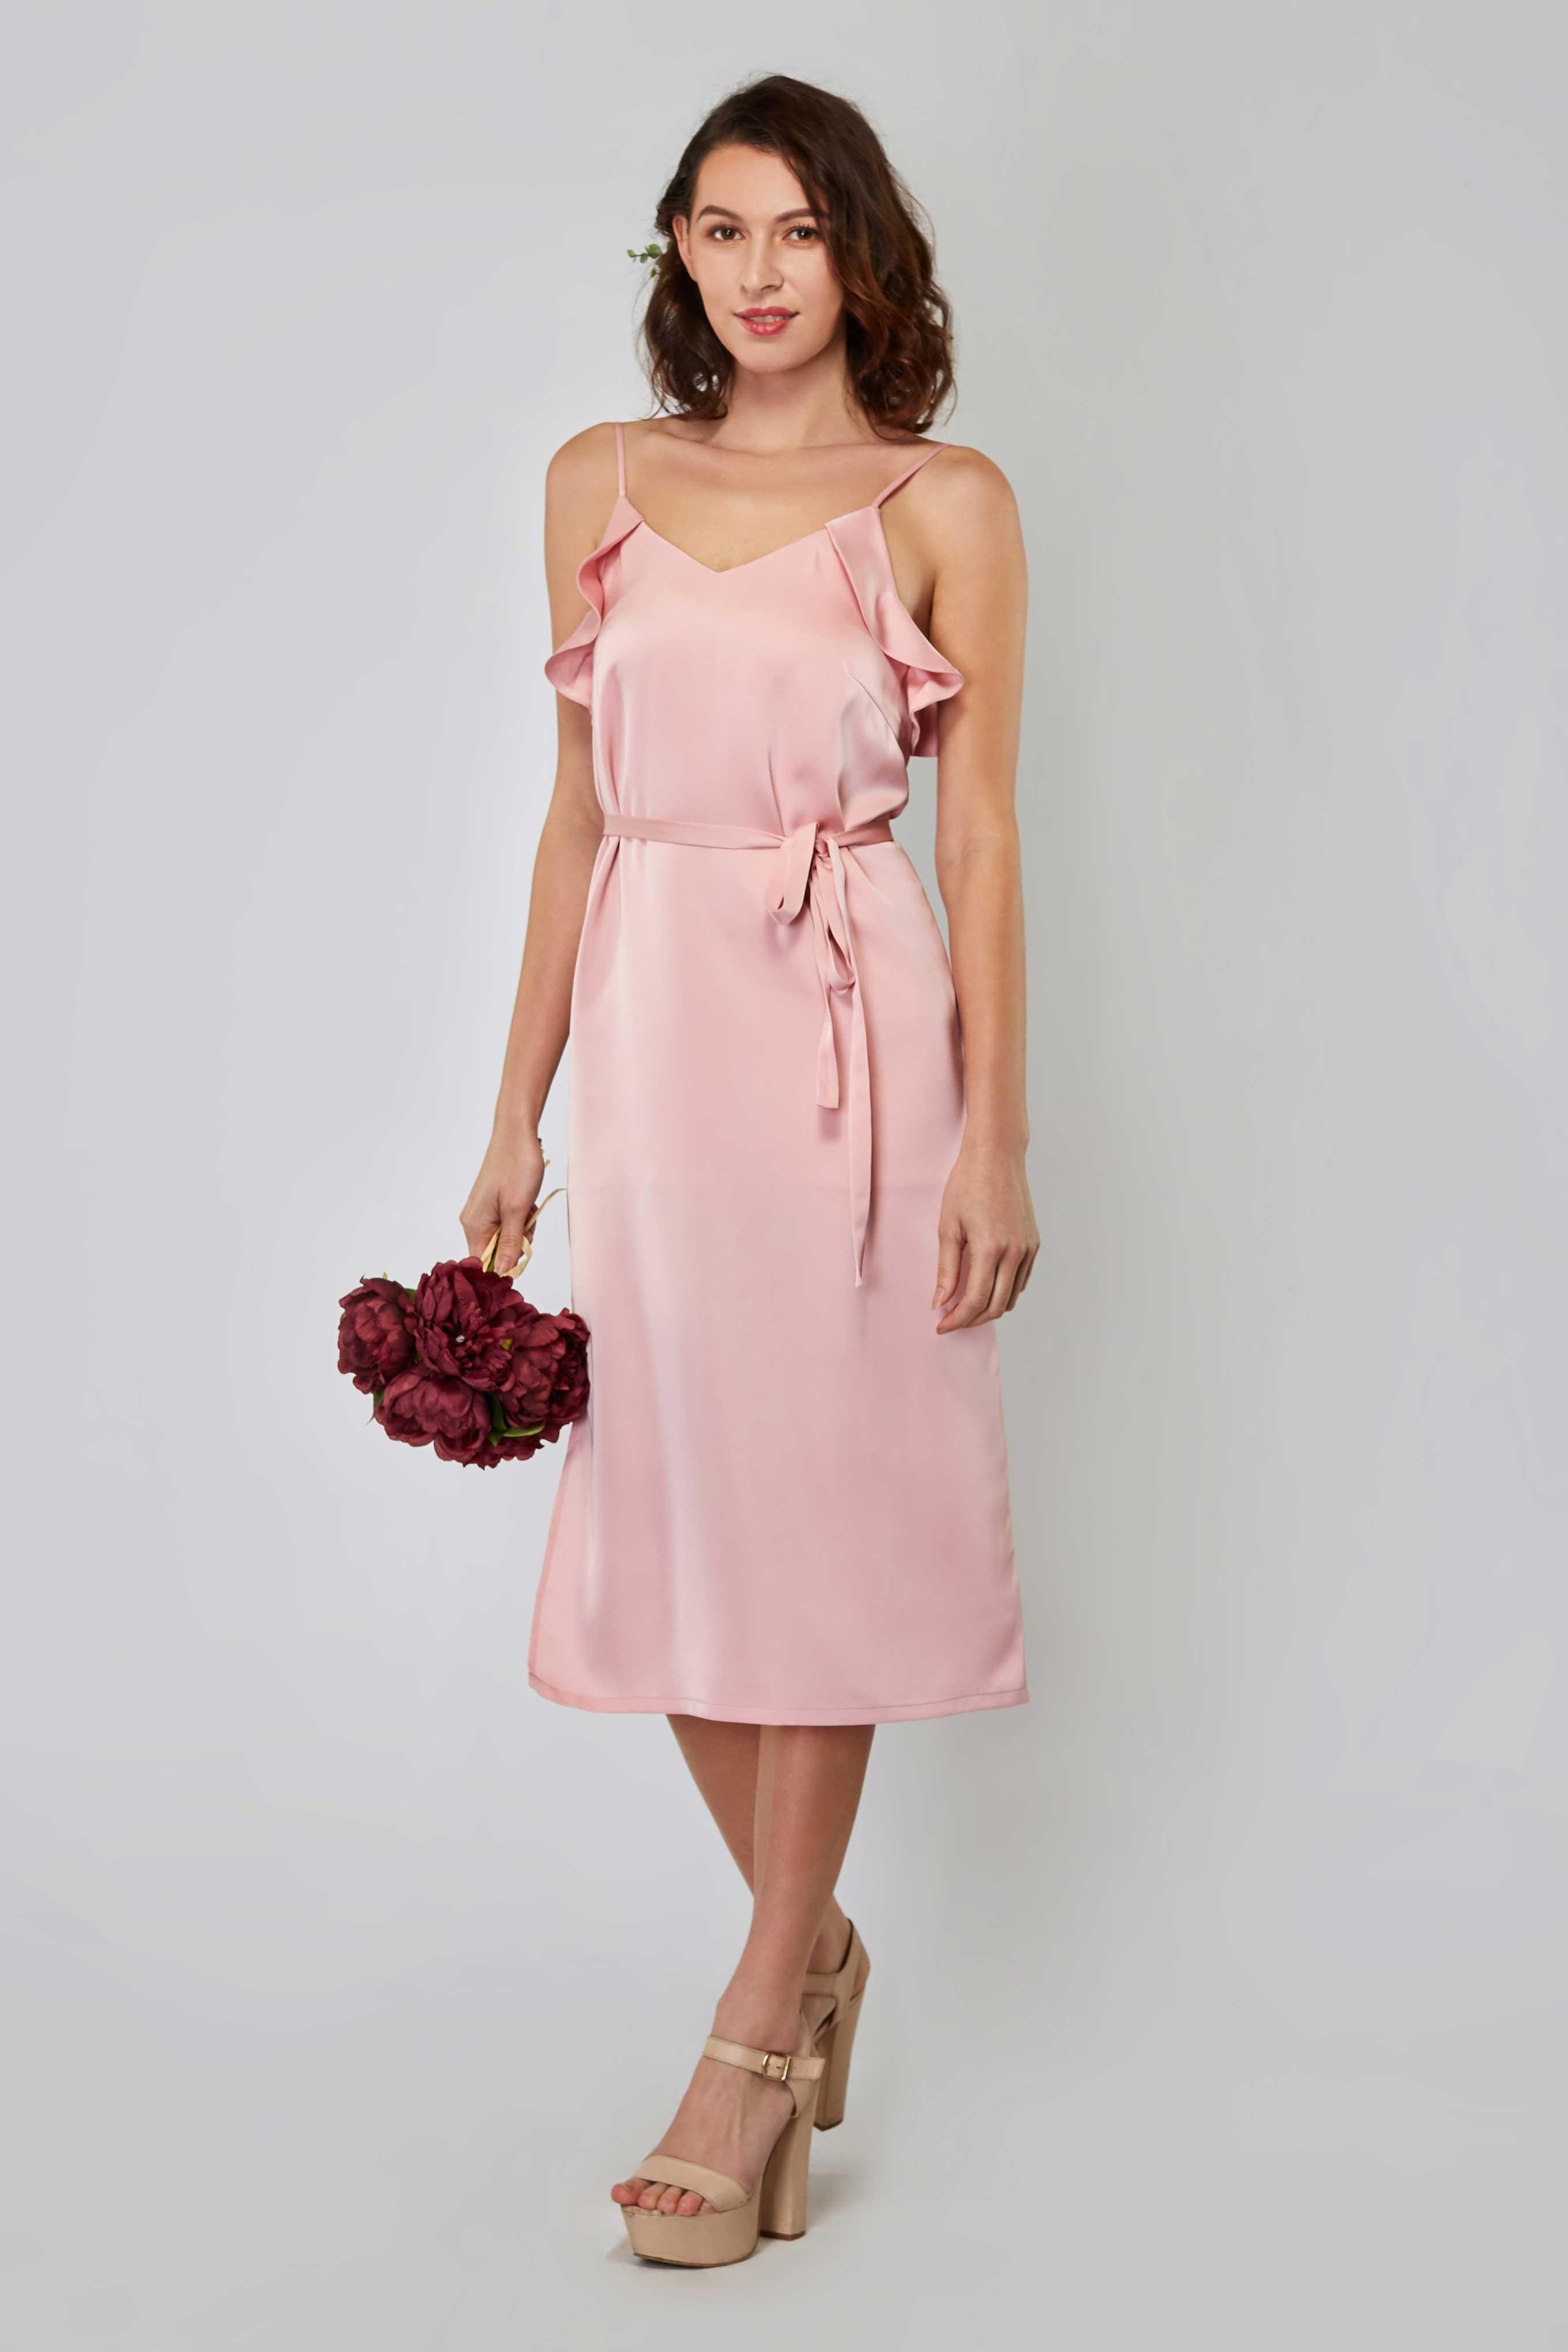 3c61a57e2252 Rita Satin Side Slit Midi Dress in Baby Blush - Baby s Breath Bridesmaids